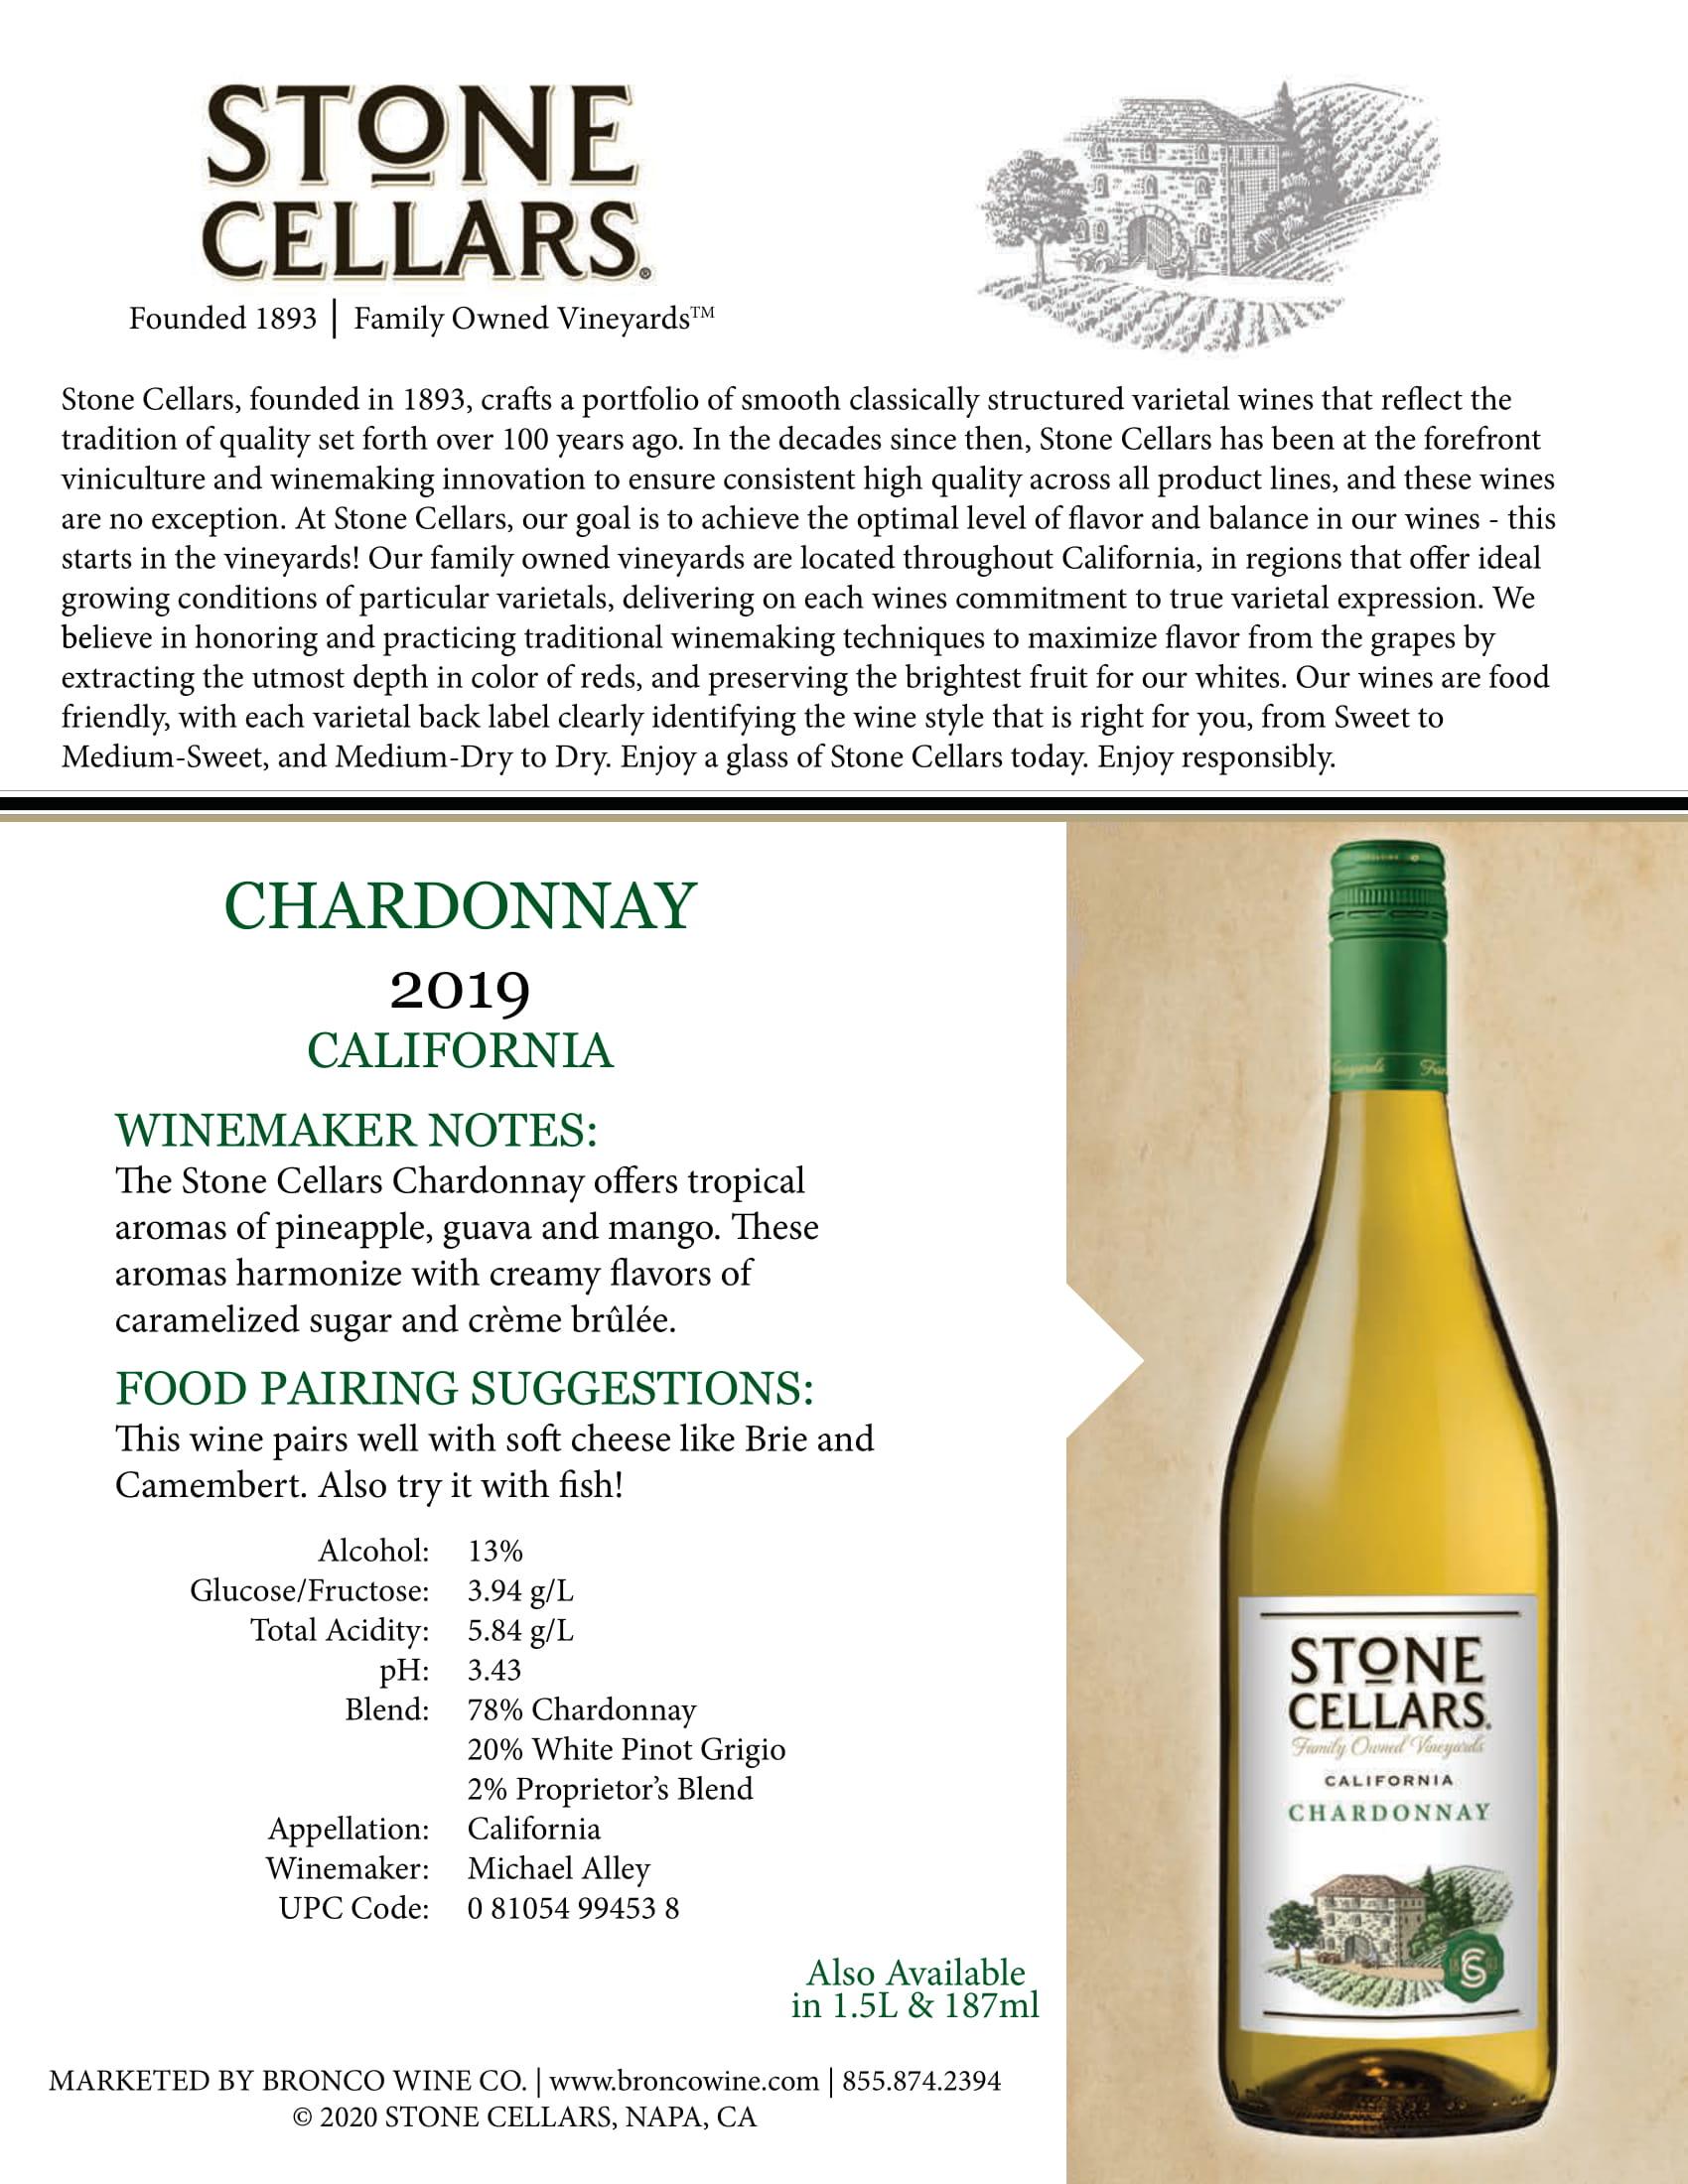 Stone Cellars Chardonnay Tech Sheet